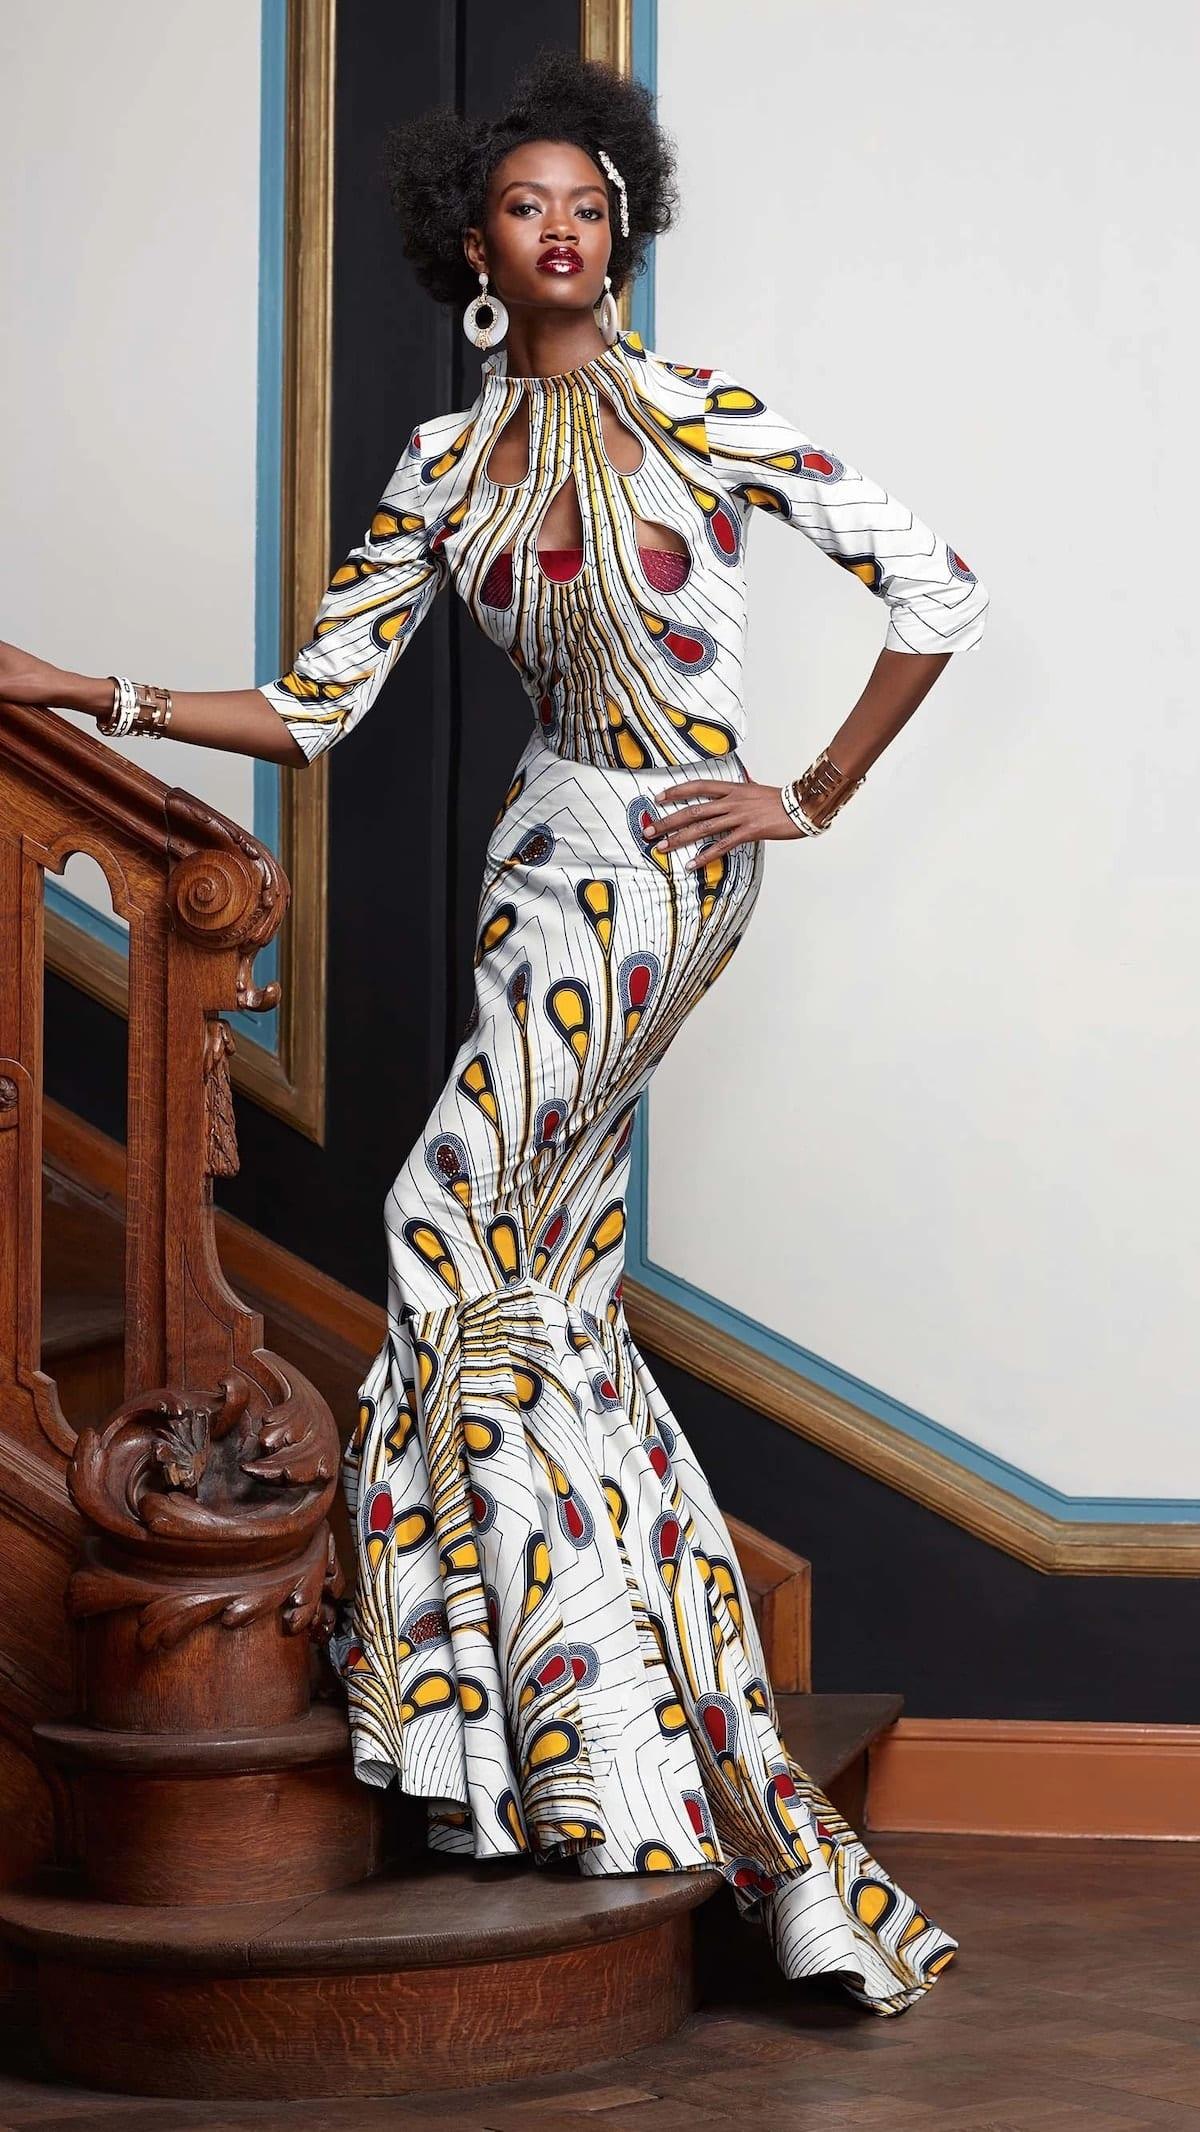 african print elegant dresses, african print skirts and dresses, african print and chiffon dresses